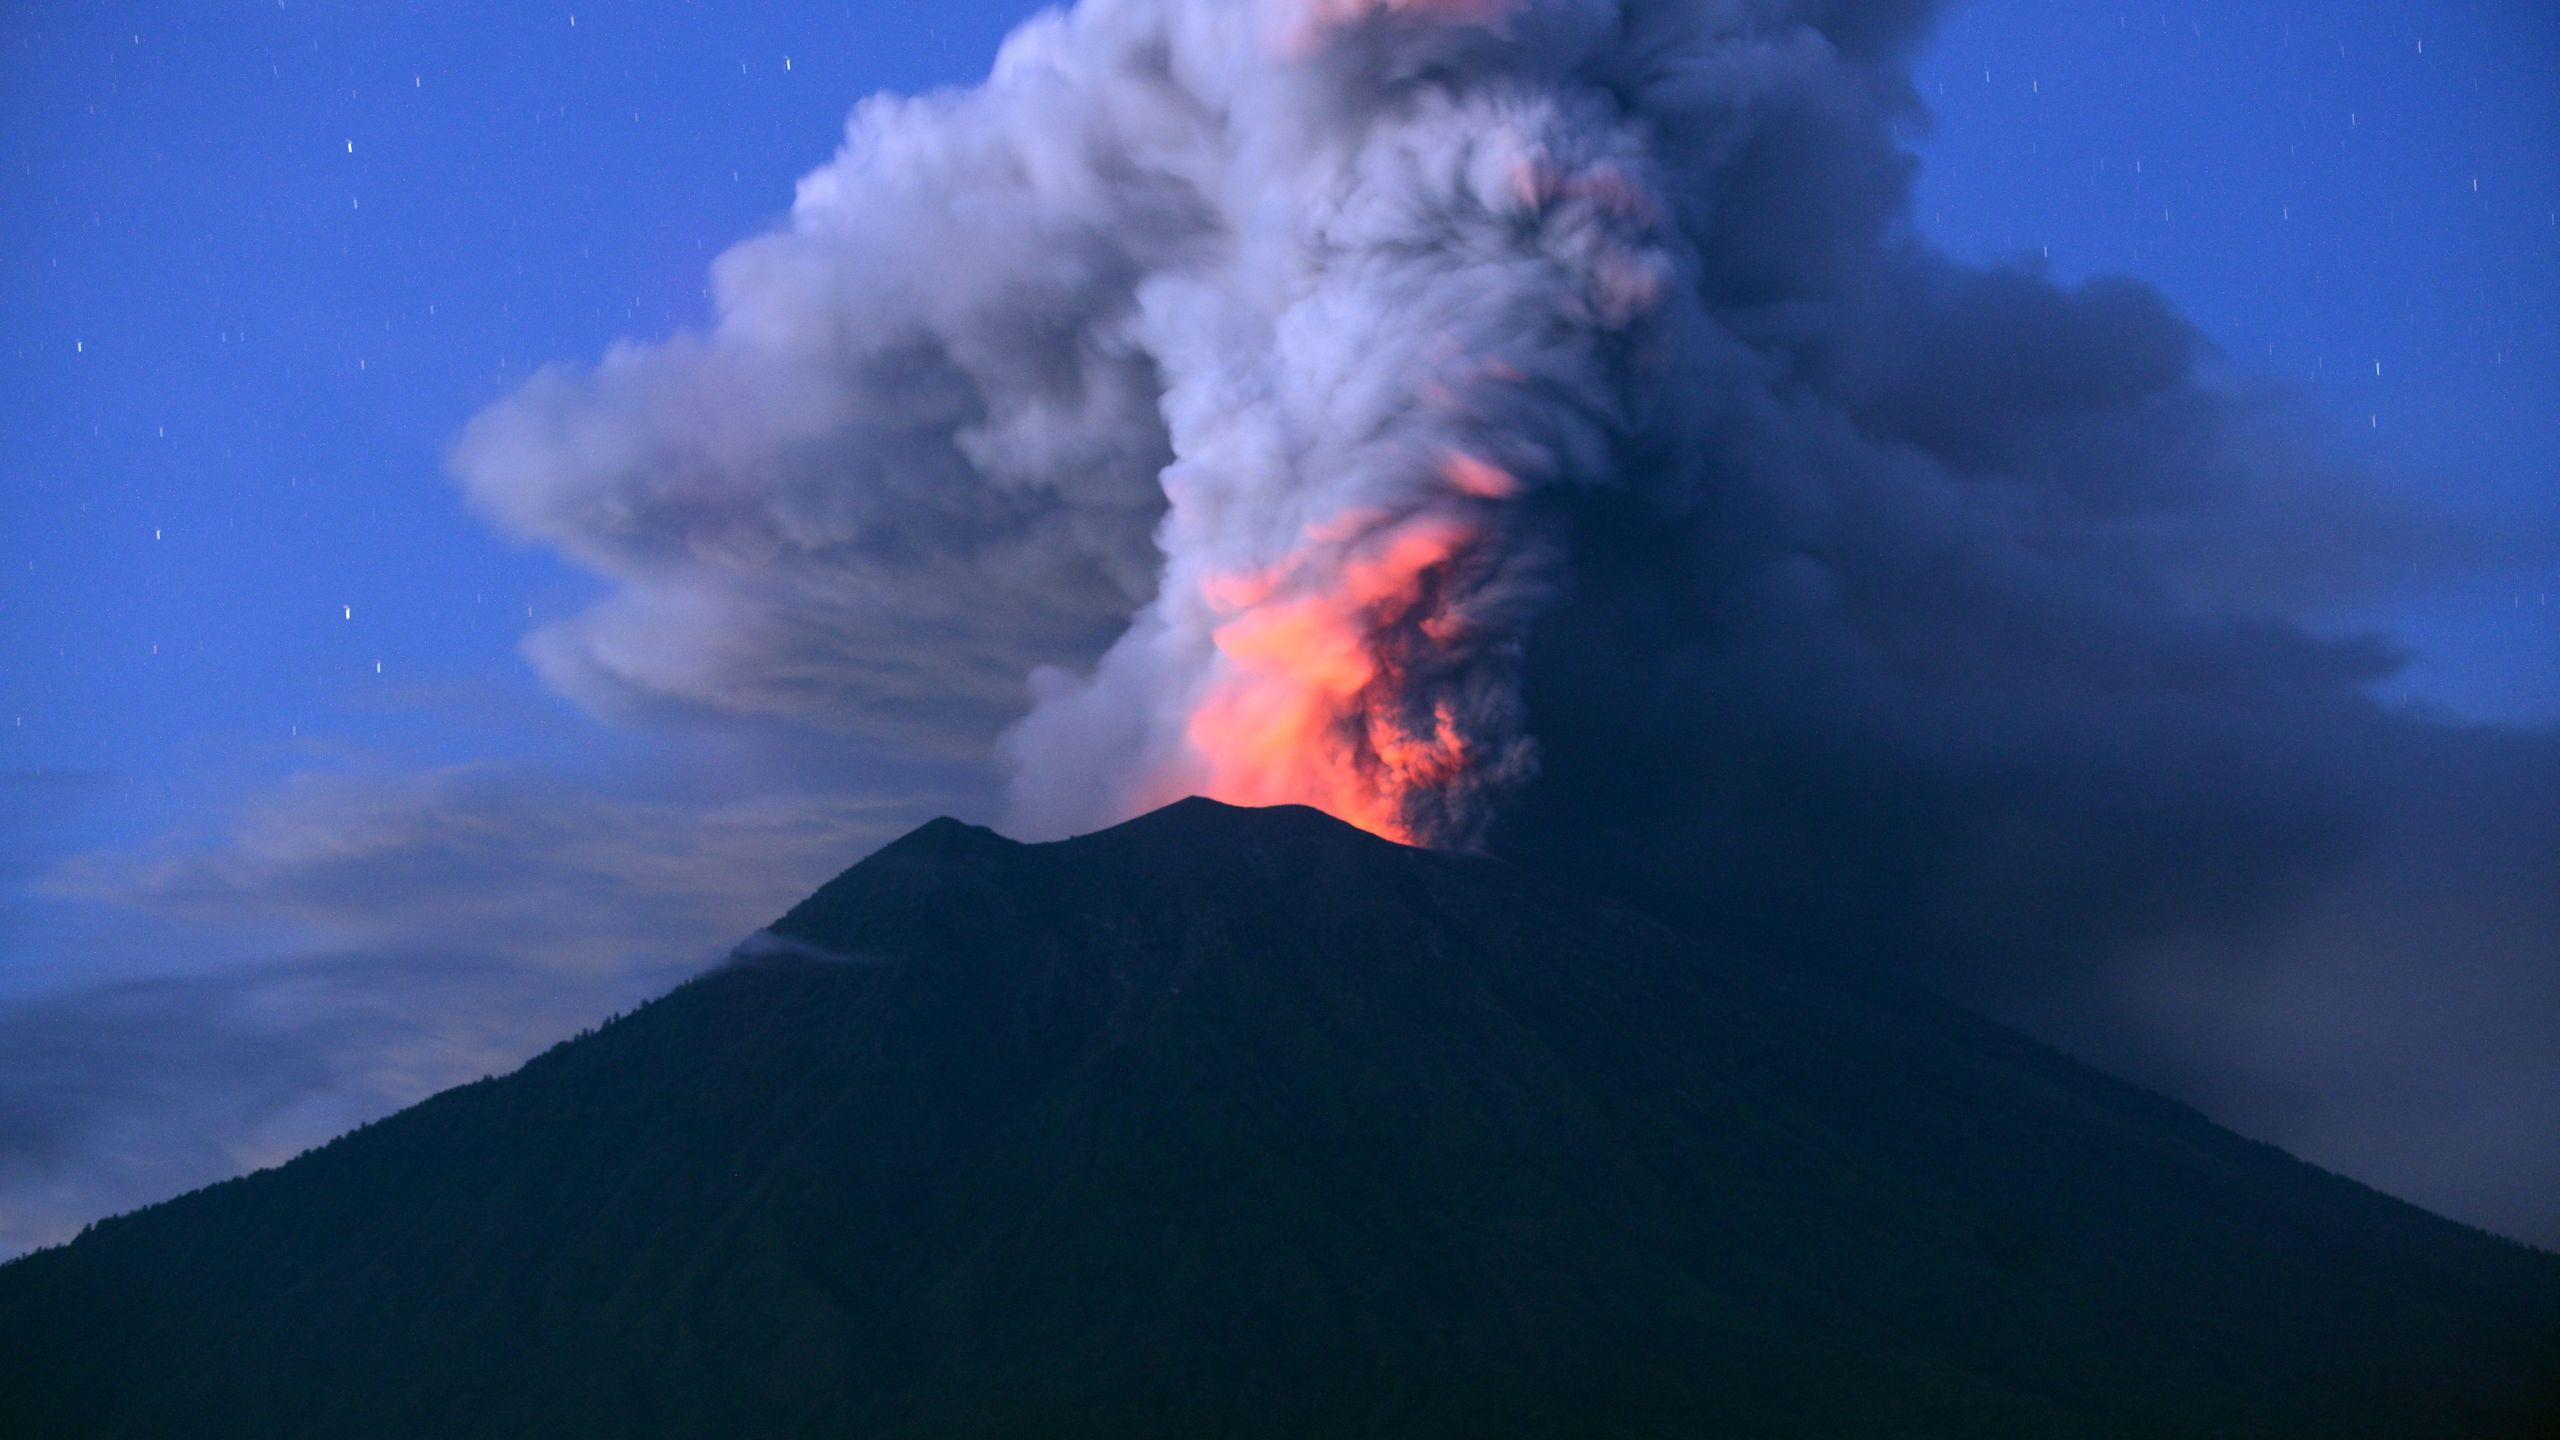 Mount Agung on Indonesia's resort island of Bali erupts on Nov. 28, 2017. (Credit: SONNY TUMBELAKA/AFP/Getty Images)